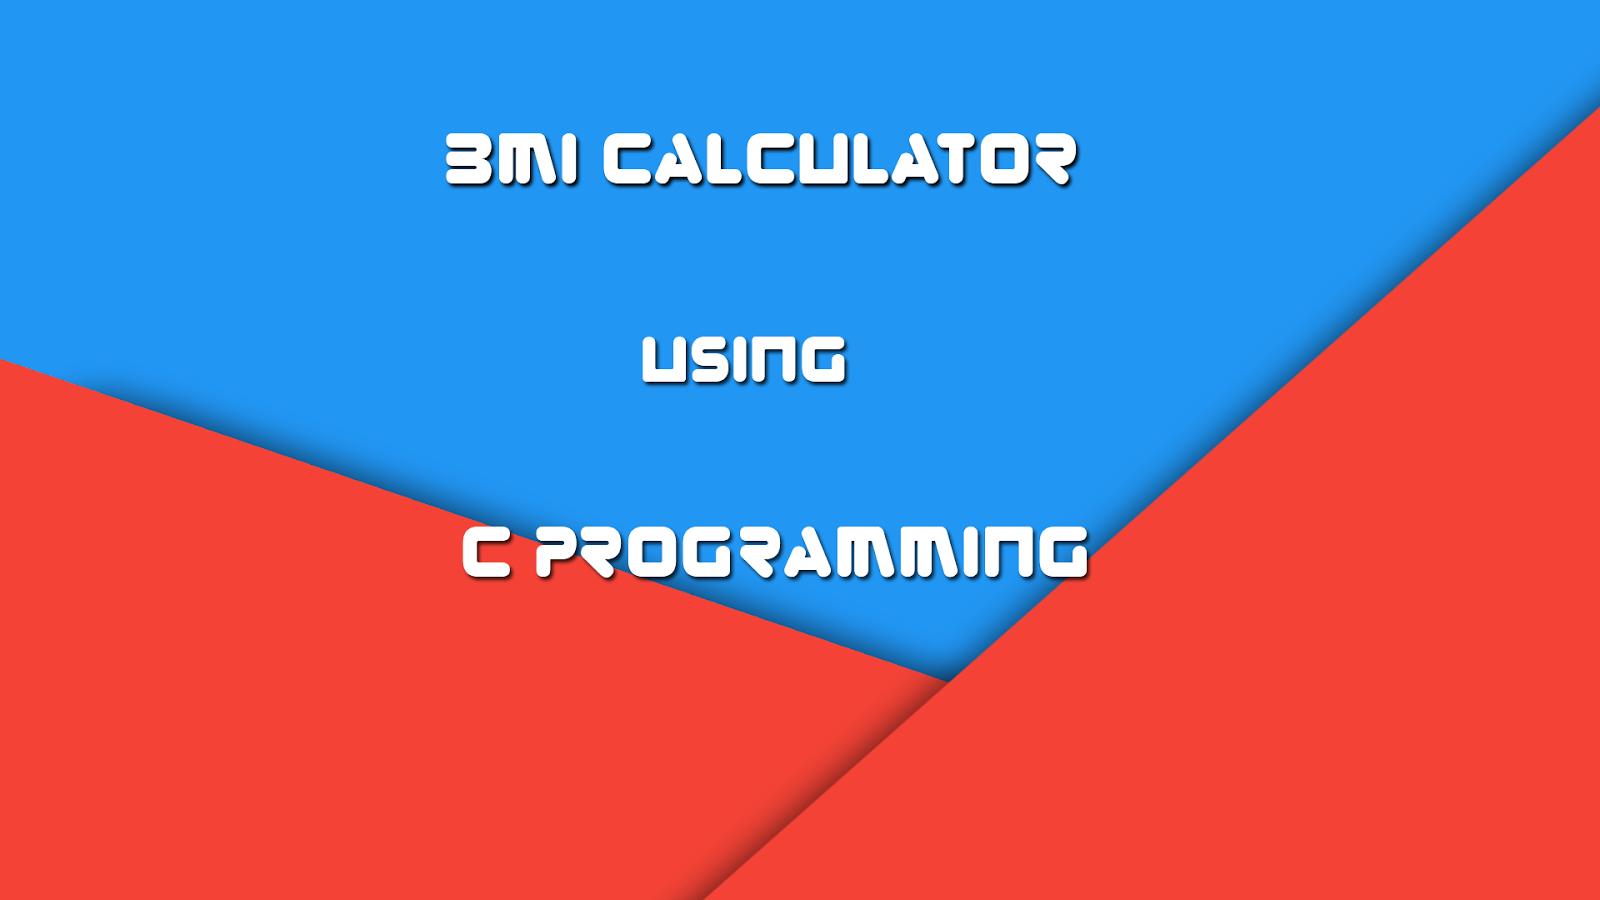 How To Make A Bmi Calculator Using C Programming Language How To Make A Bmi  Calculator